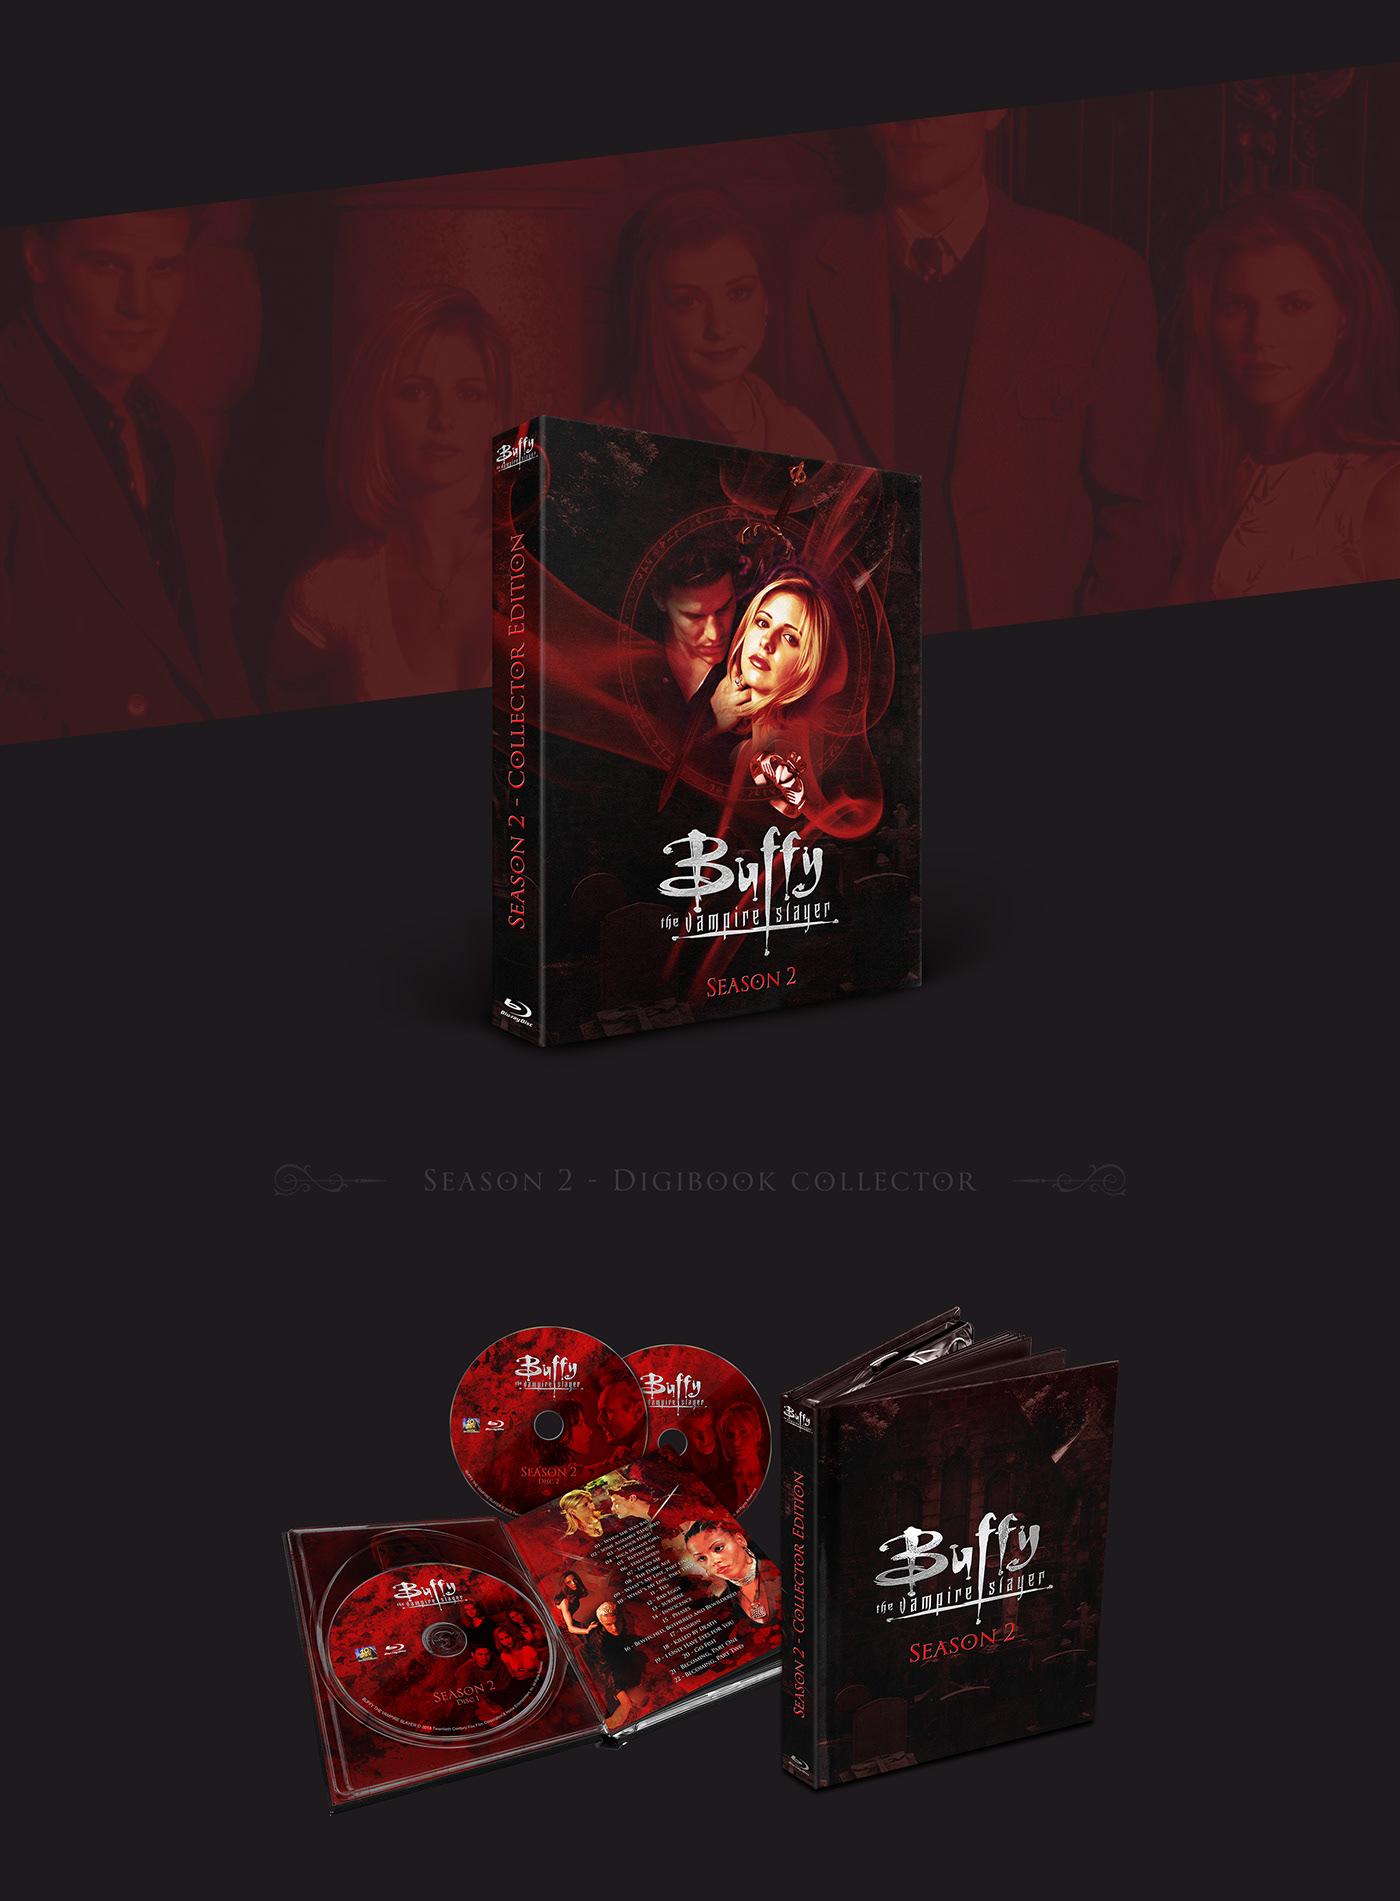 Buffy btvs vampire slayer Joss Whedon willow xander bluray Sarah Michelle Gellar Sunnydale